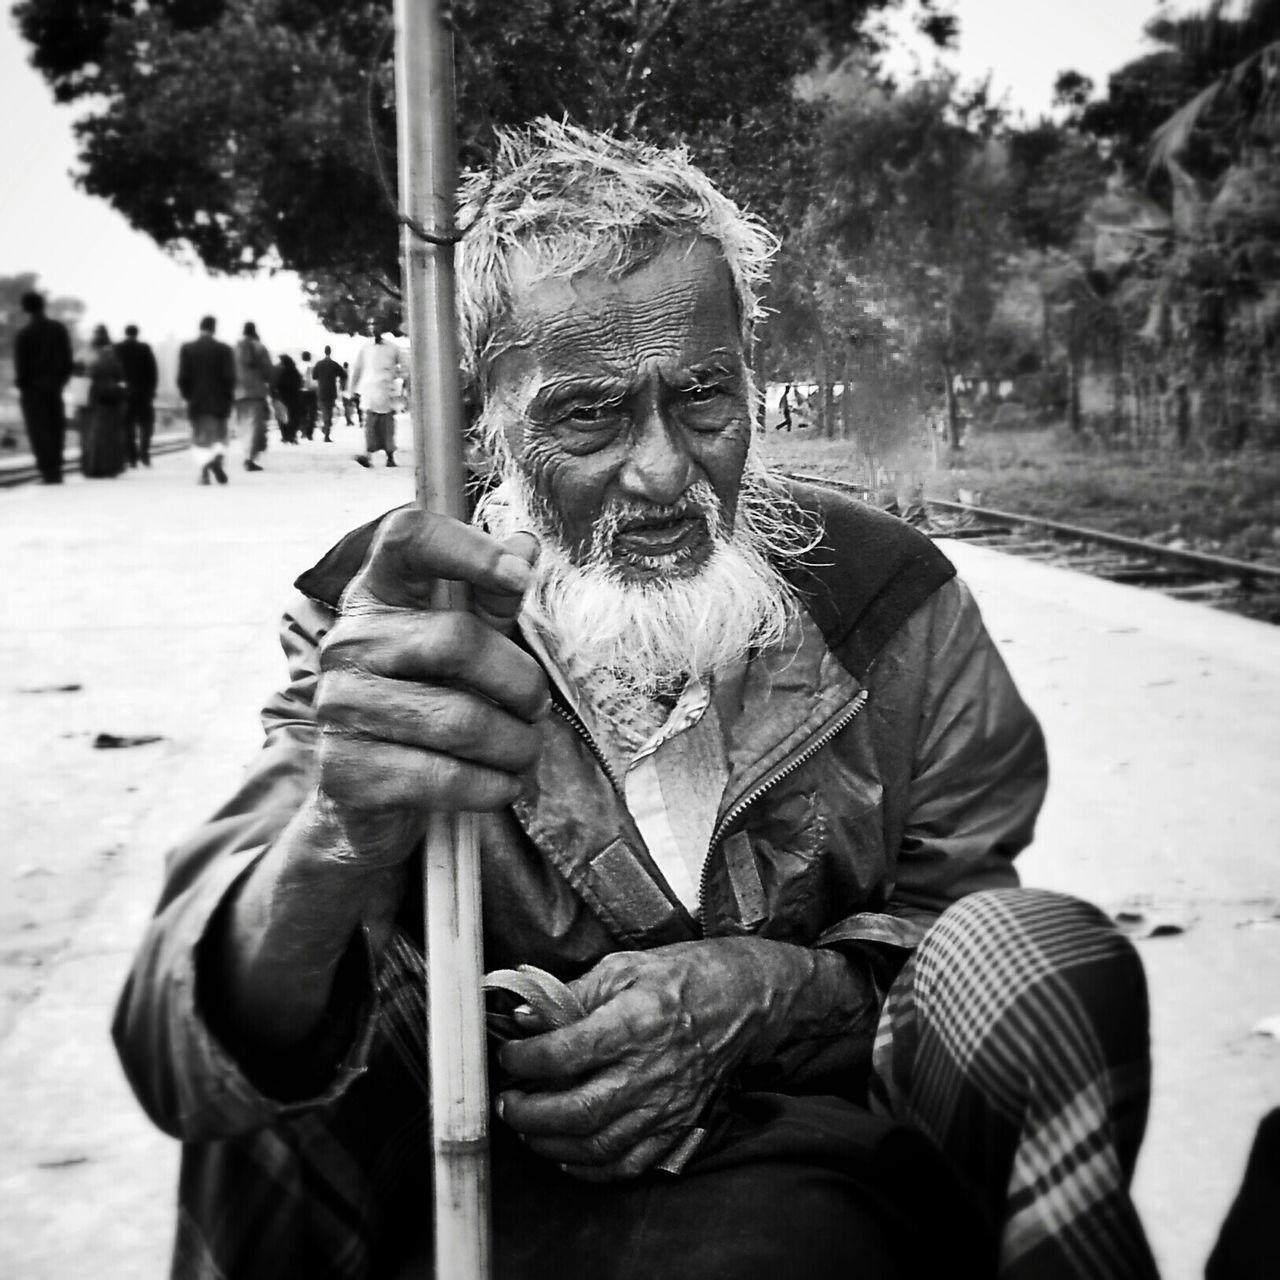 Oldman Bangladesh Streetlife Faces Of EyeEm Smiling Strangers People Of Bangladesh EyeEm Best Shots Portrait Street Photography Jessore